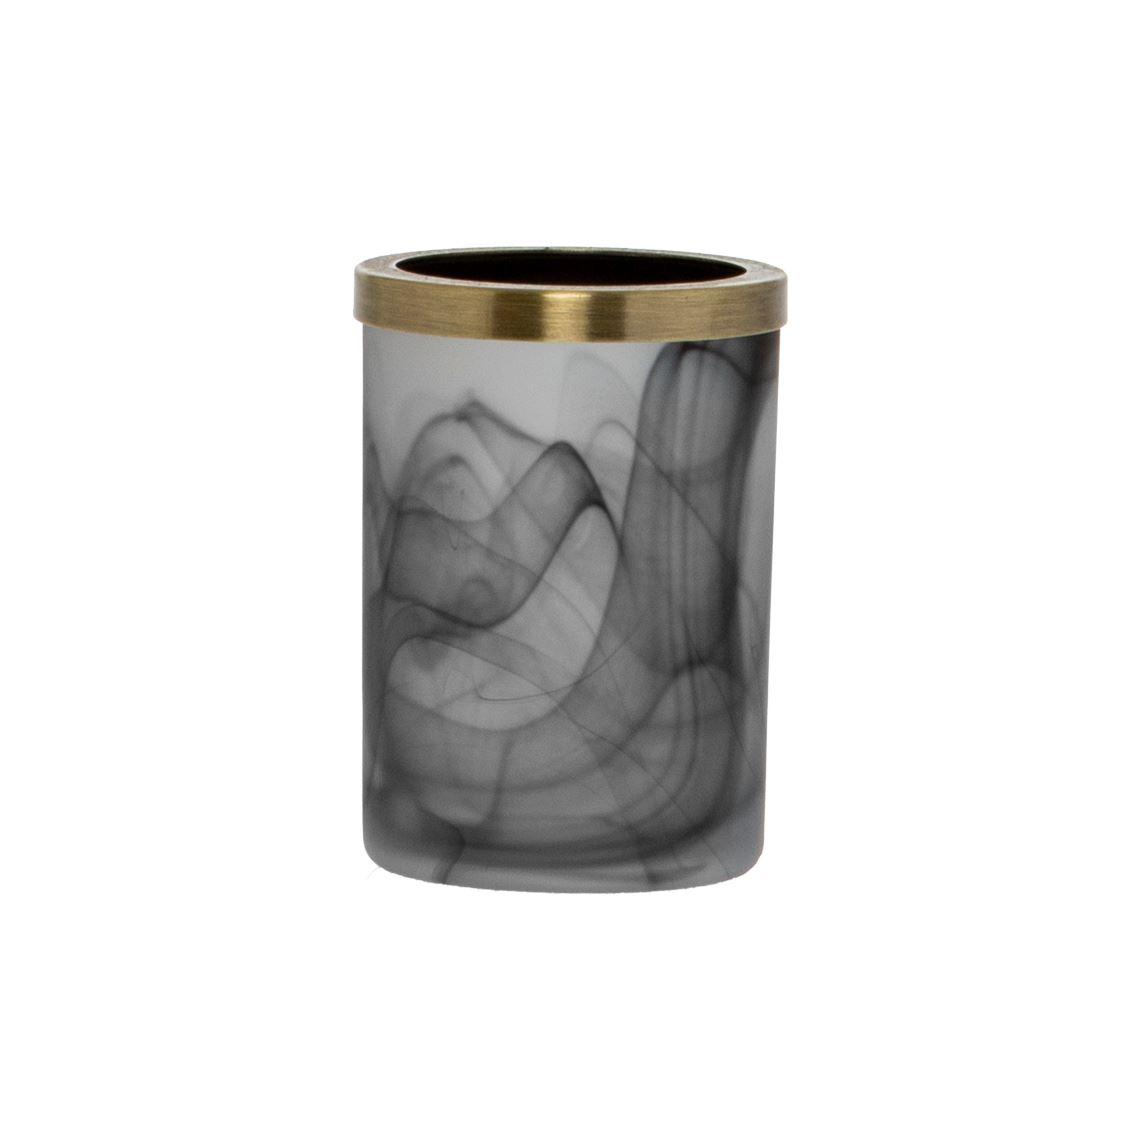 Sebon Tumbler Size W 8cm x D 8cm x H 11cm in Black Freedom